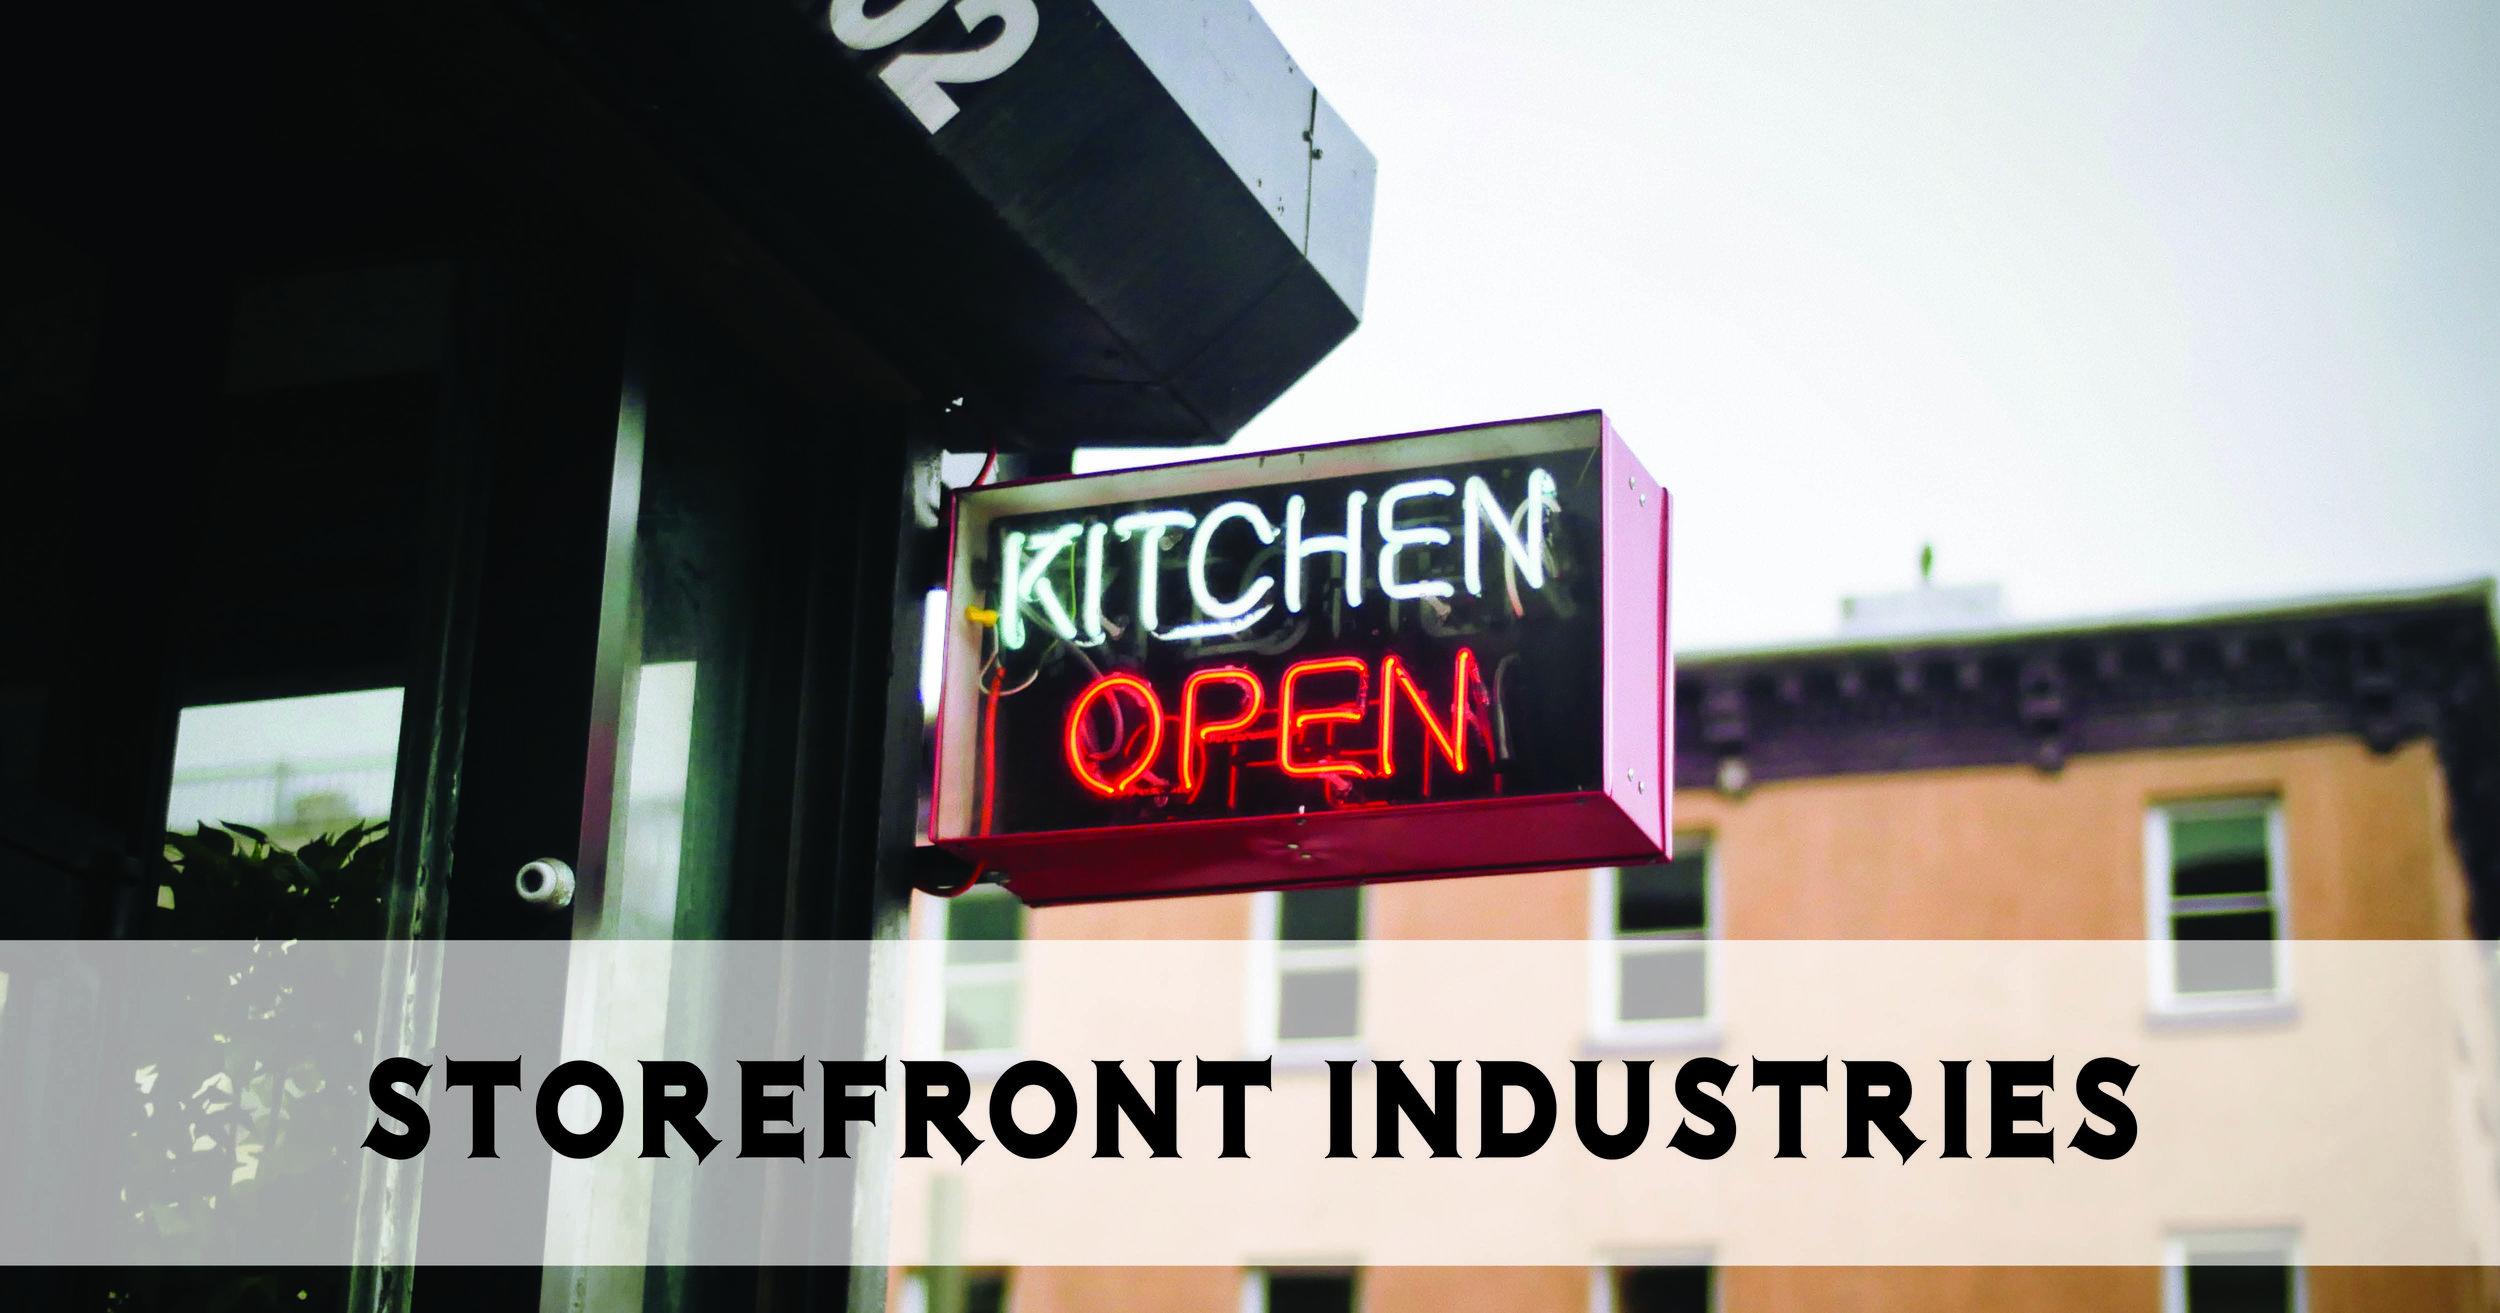 Storefront industries.jpg